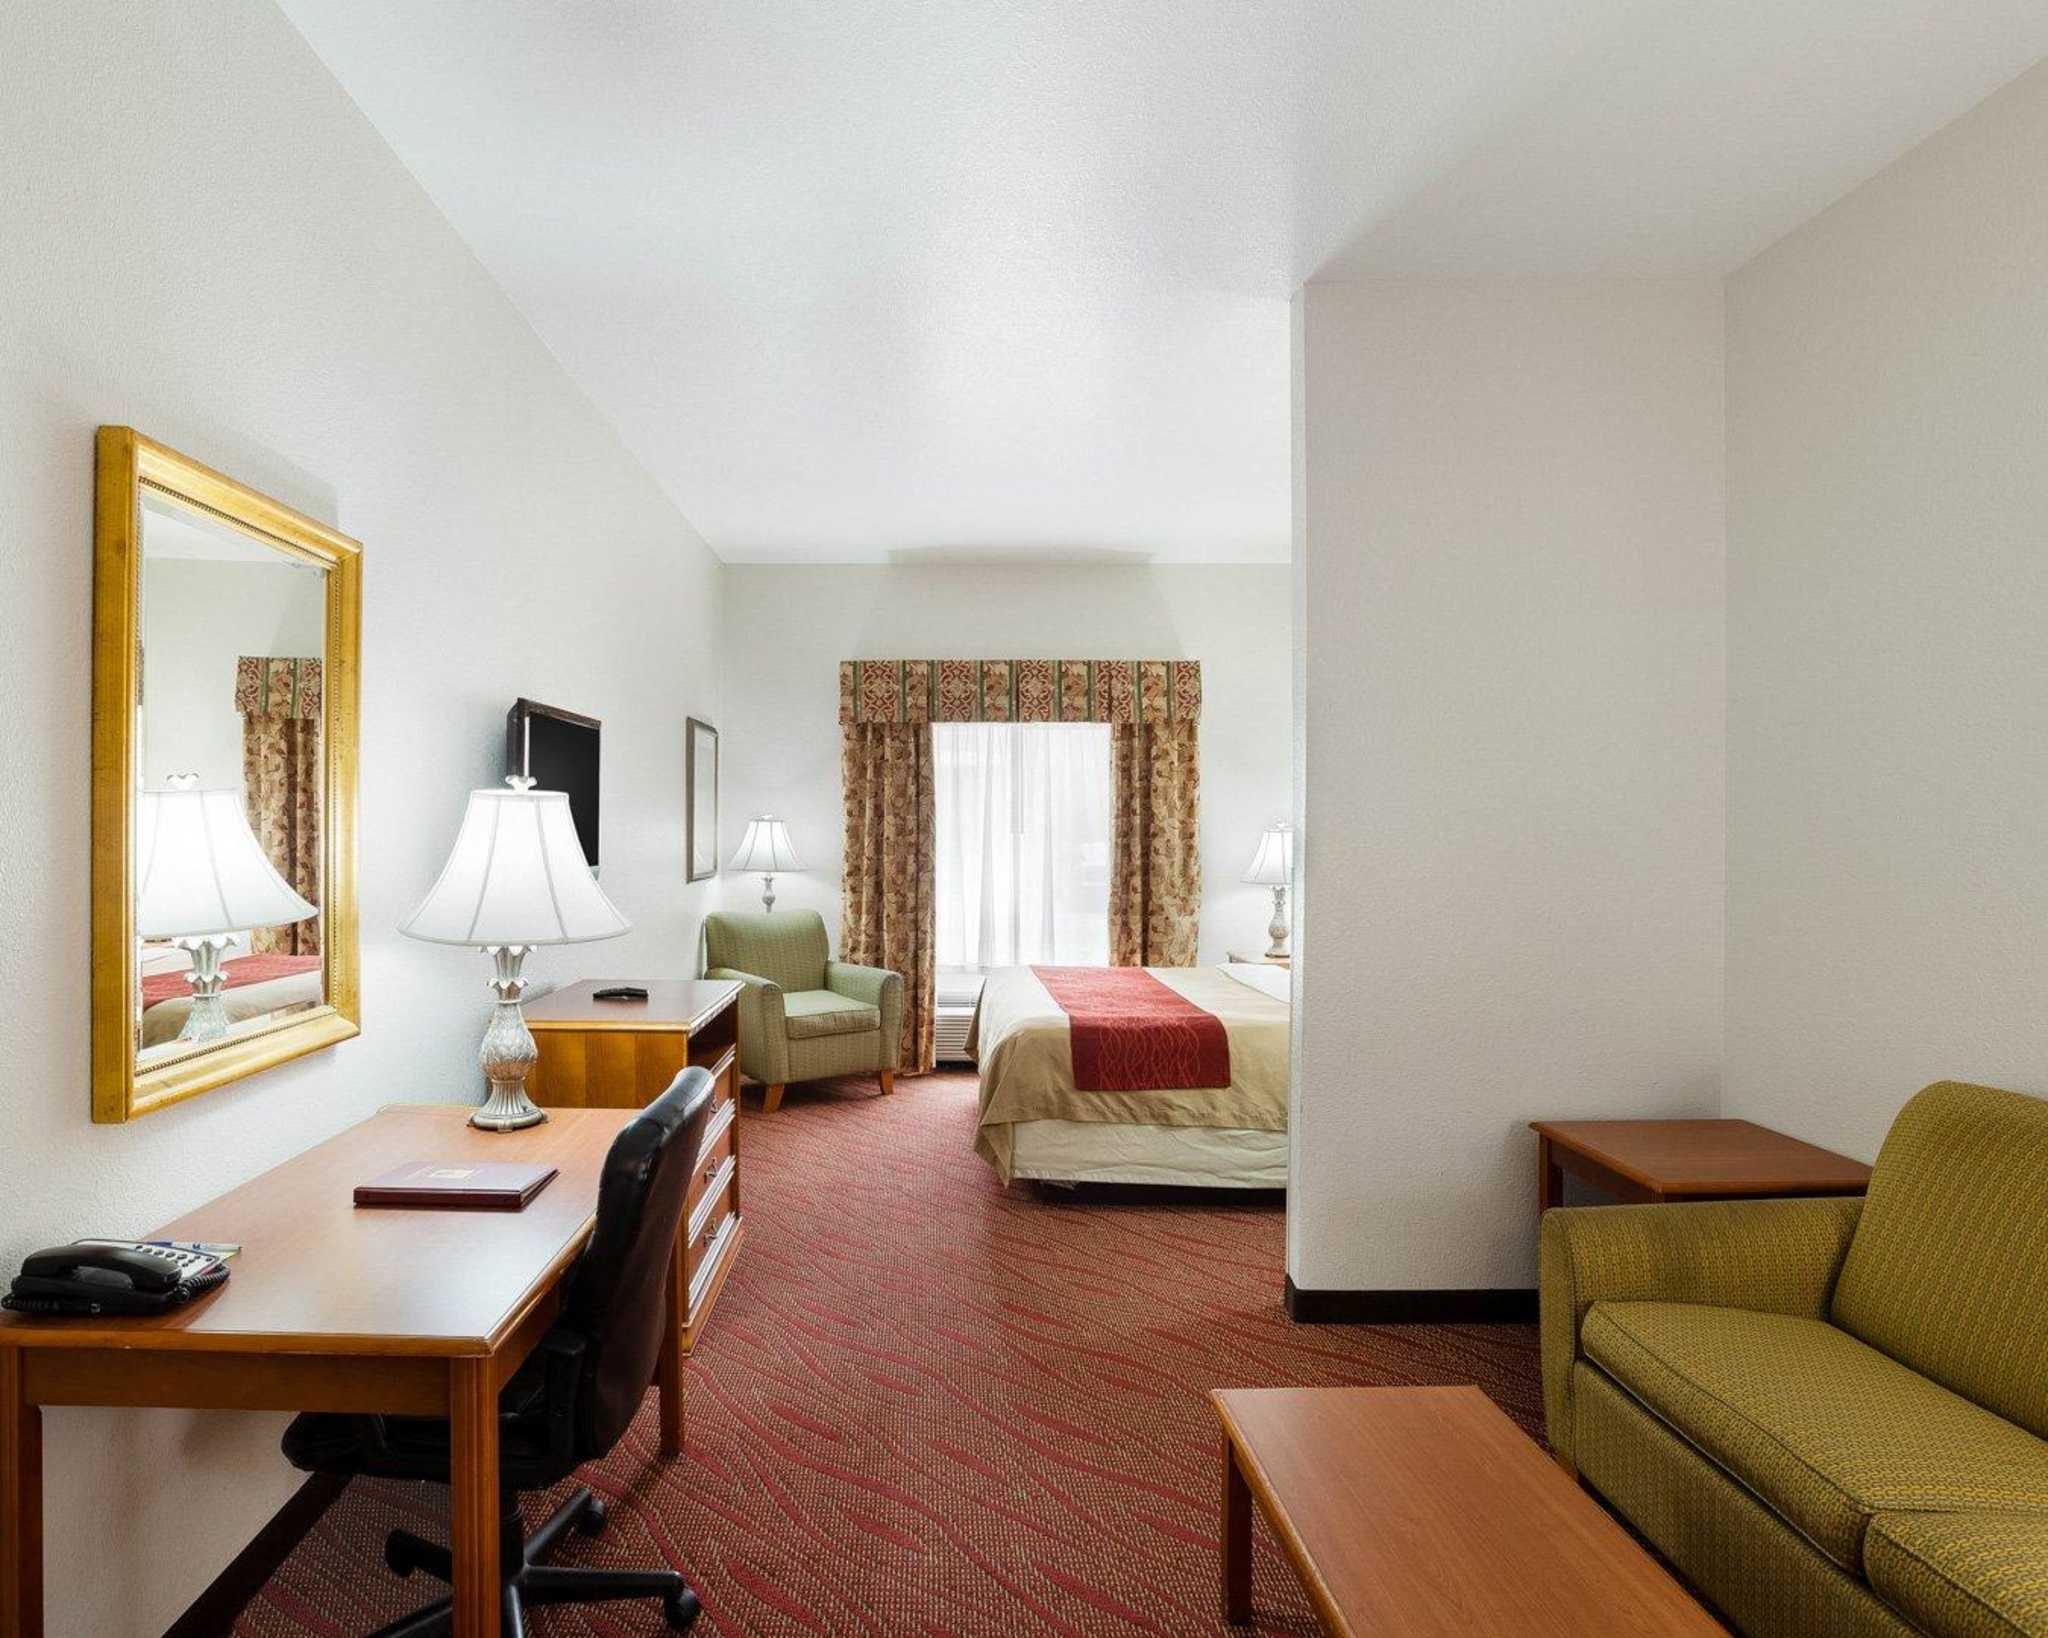 Comfort Inn & Suites Near Medical Center image 19